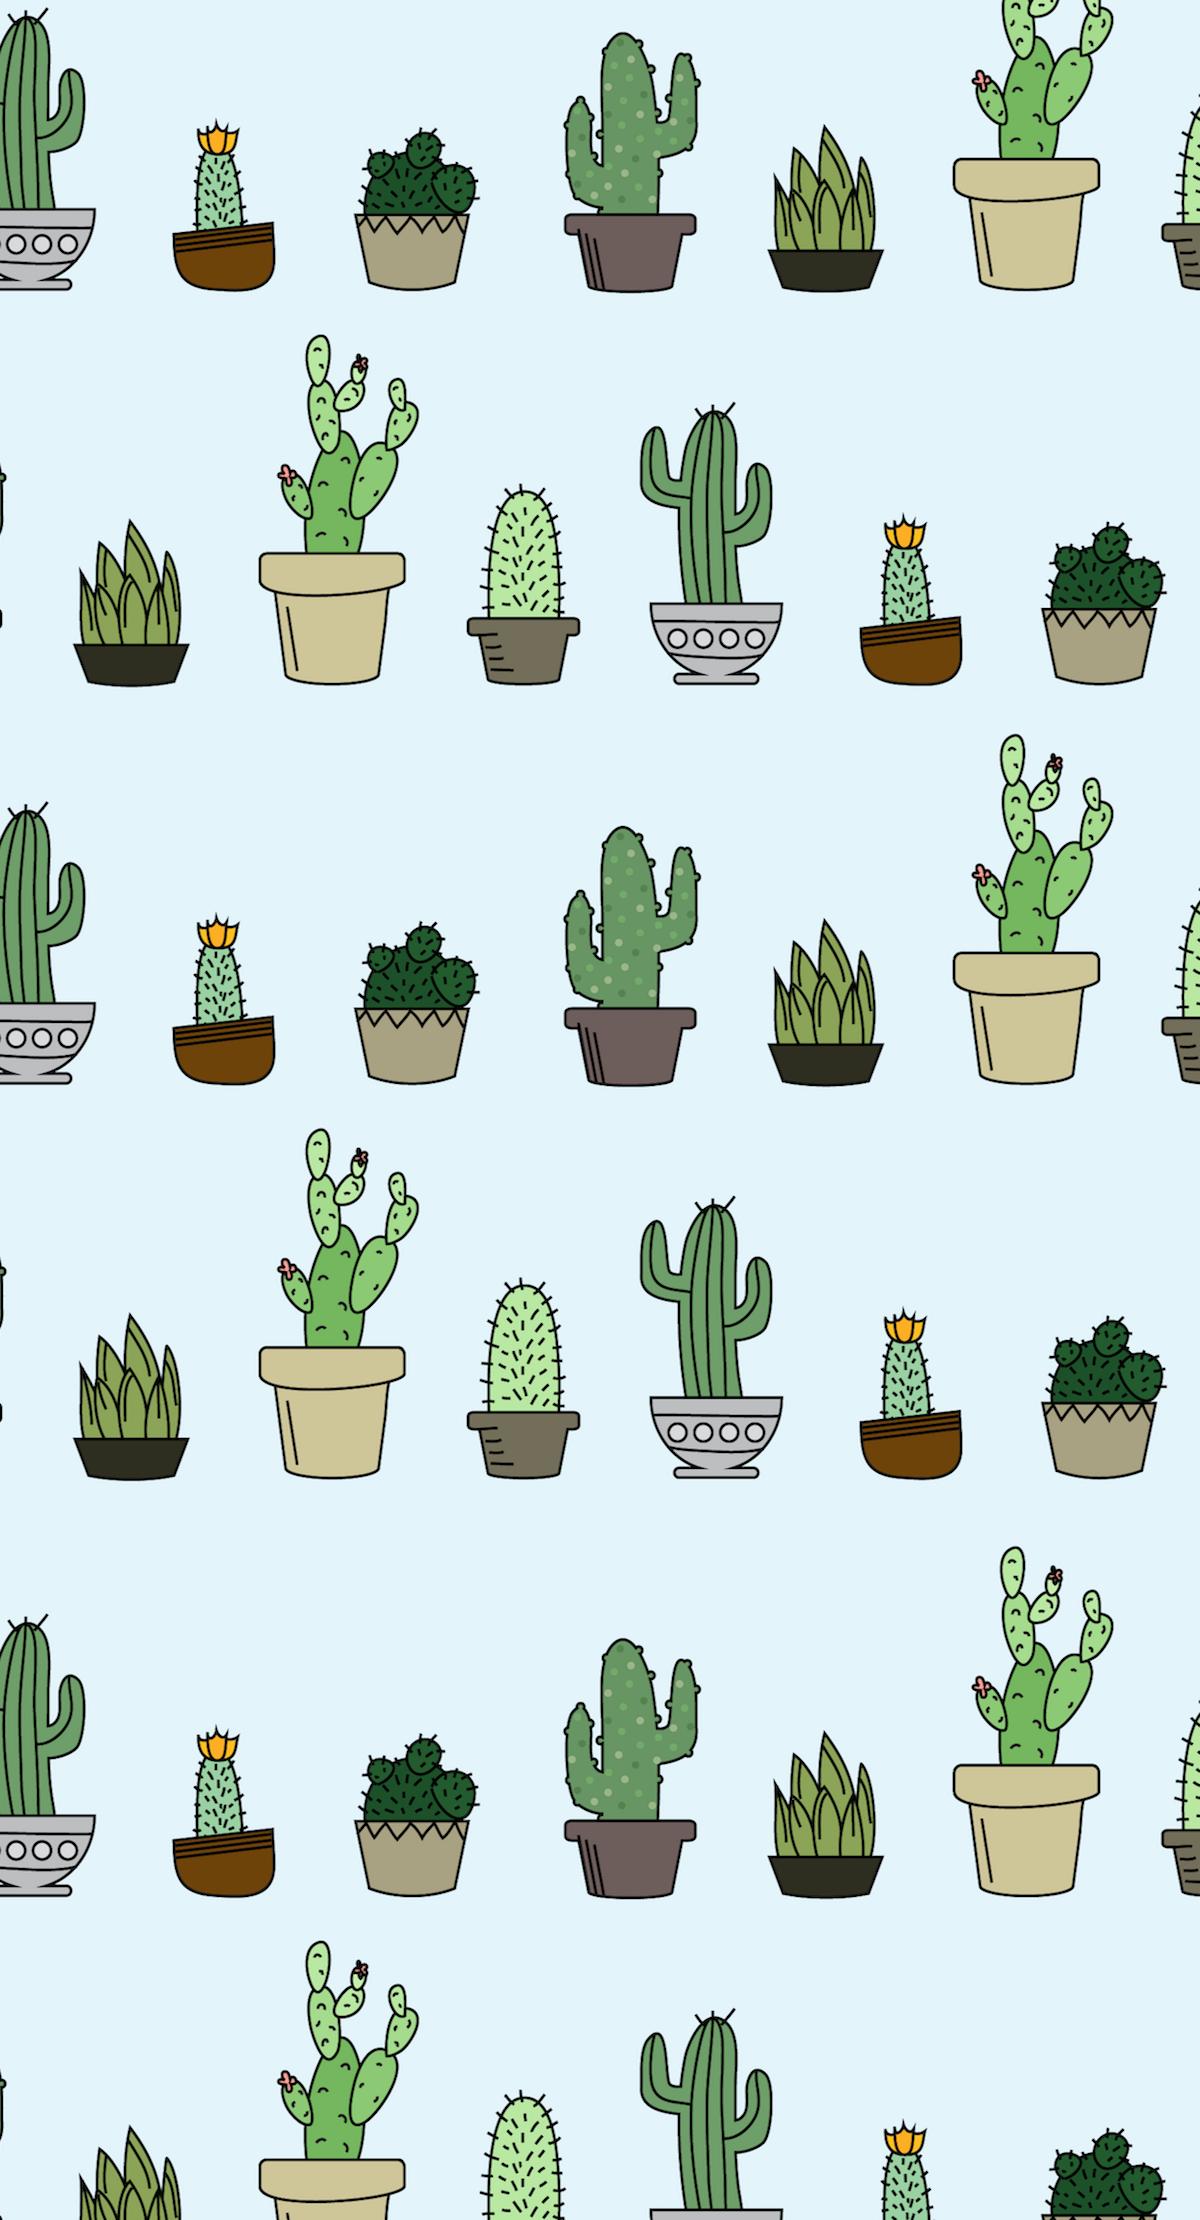 Freebie Succulent Wallpaper Greenery, Cacti and Wallpaper